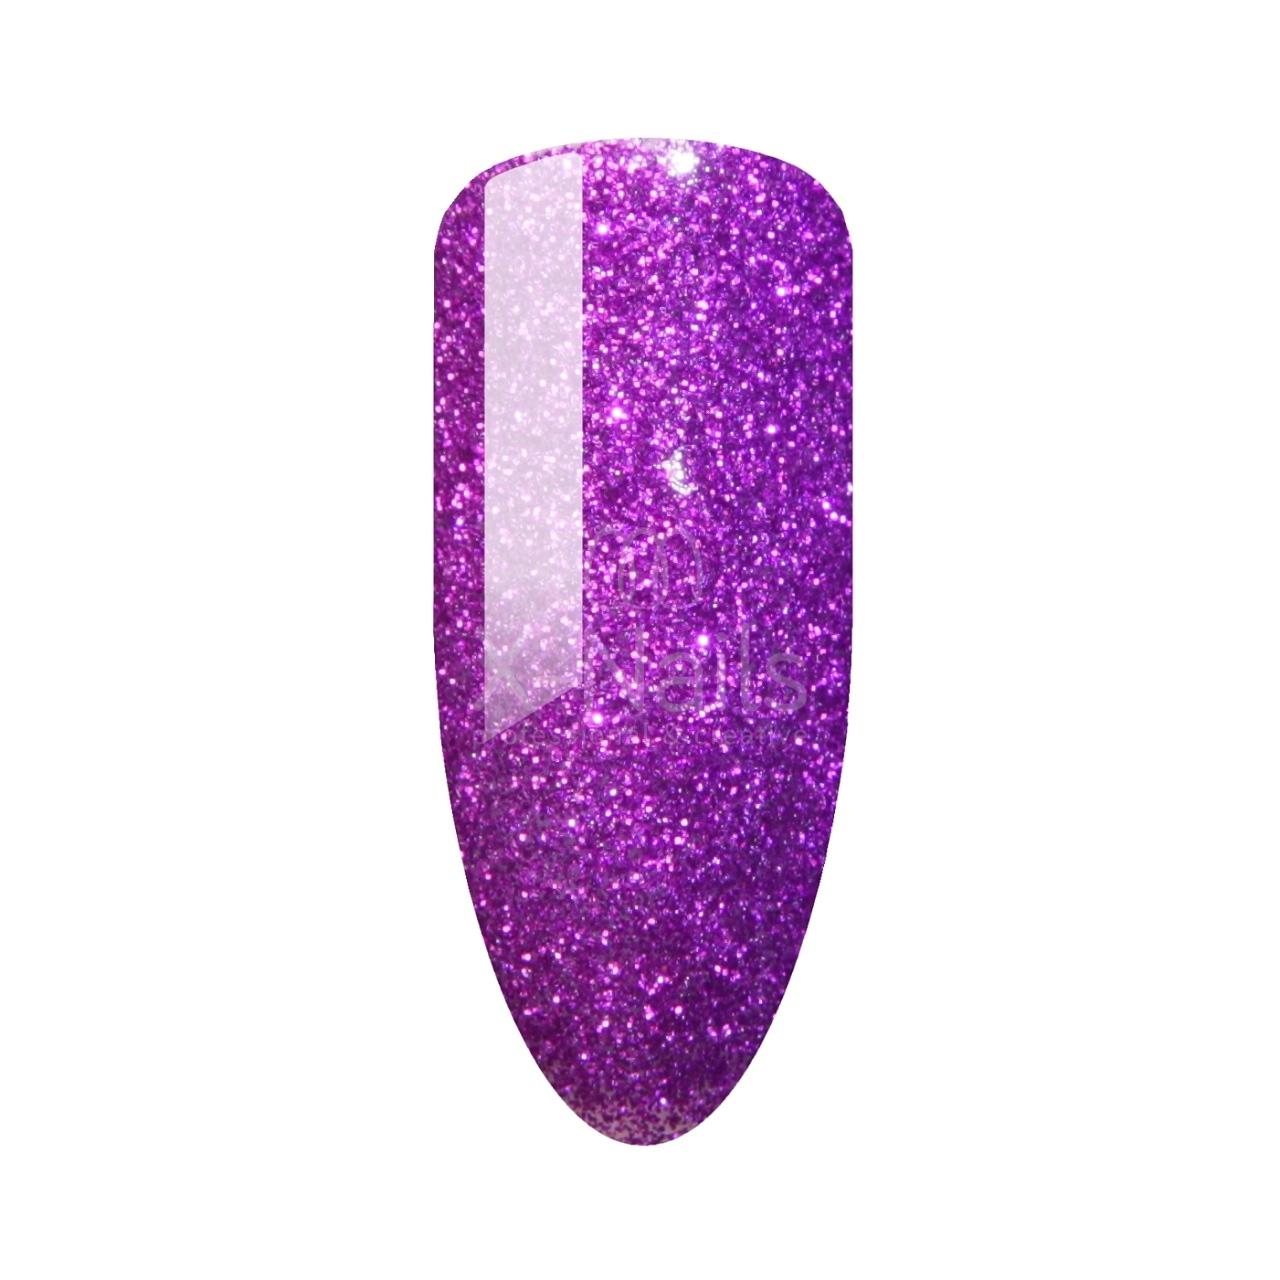 Gel Lak Amazing Line 5 Ml Imperial Glitter X Nails